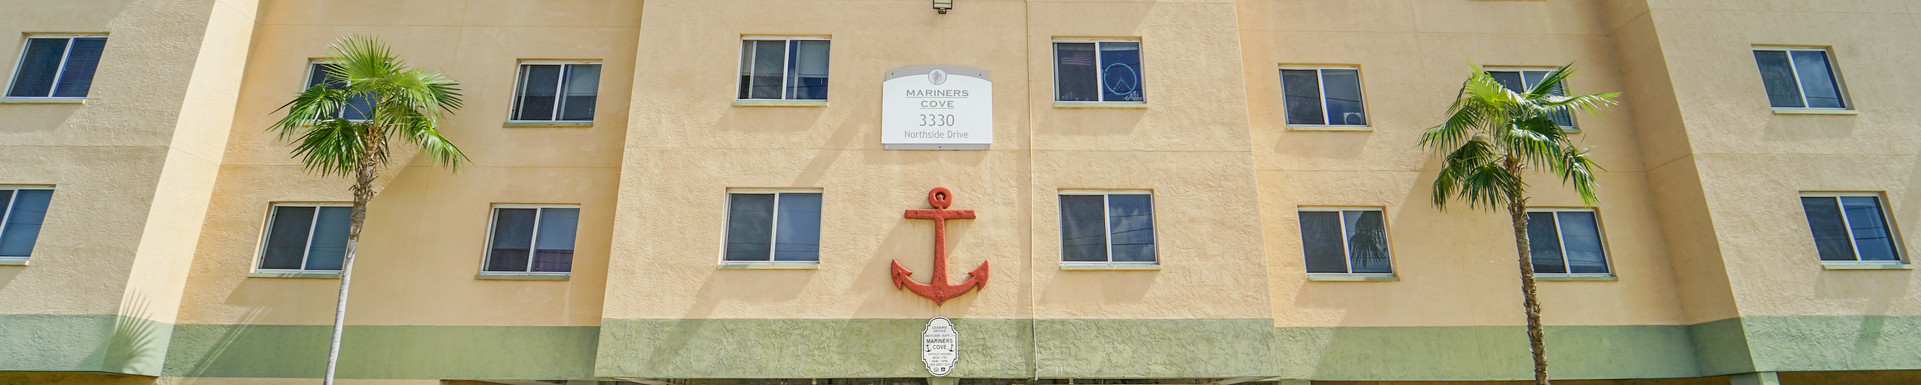 Mariner's Cove Exterior Photo